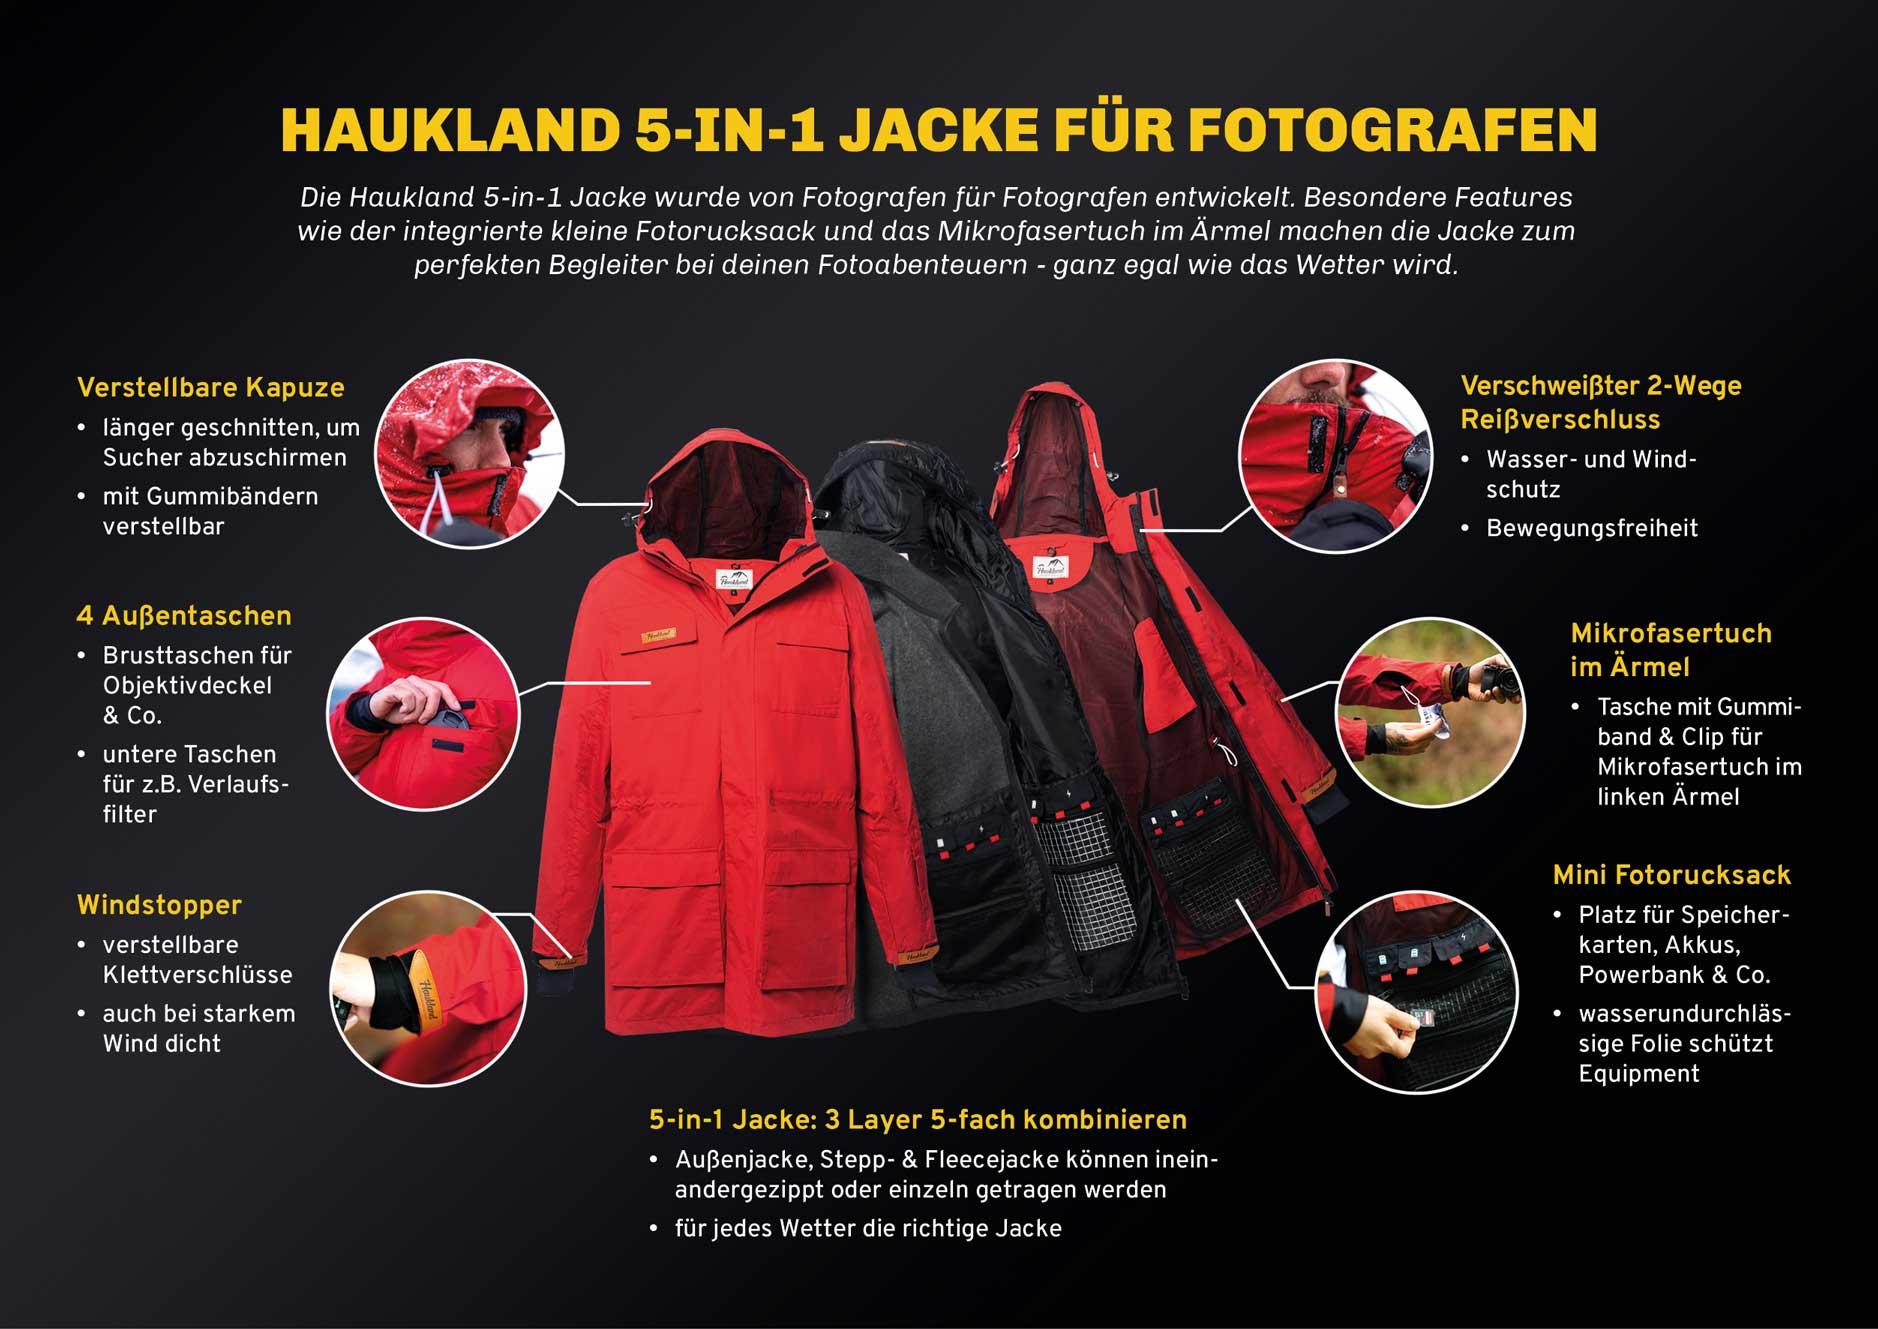 Haukland 5 in 1 Jacke Features